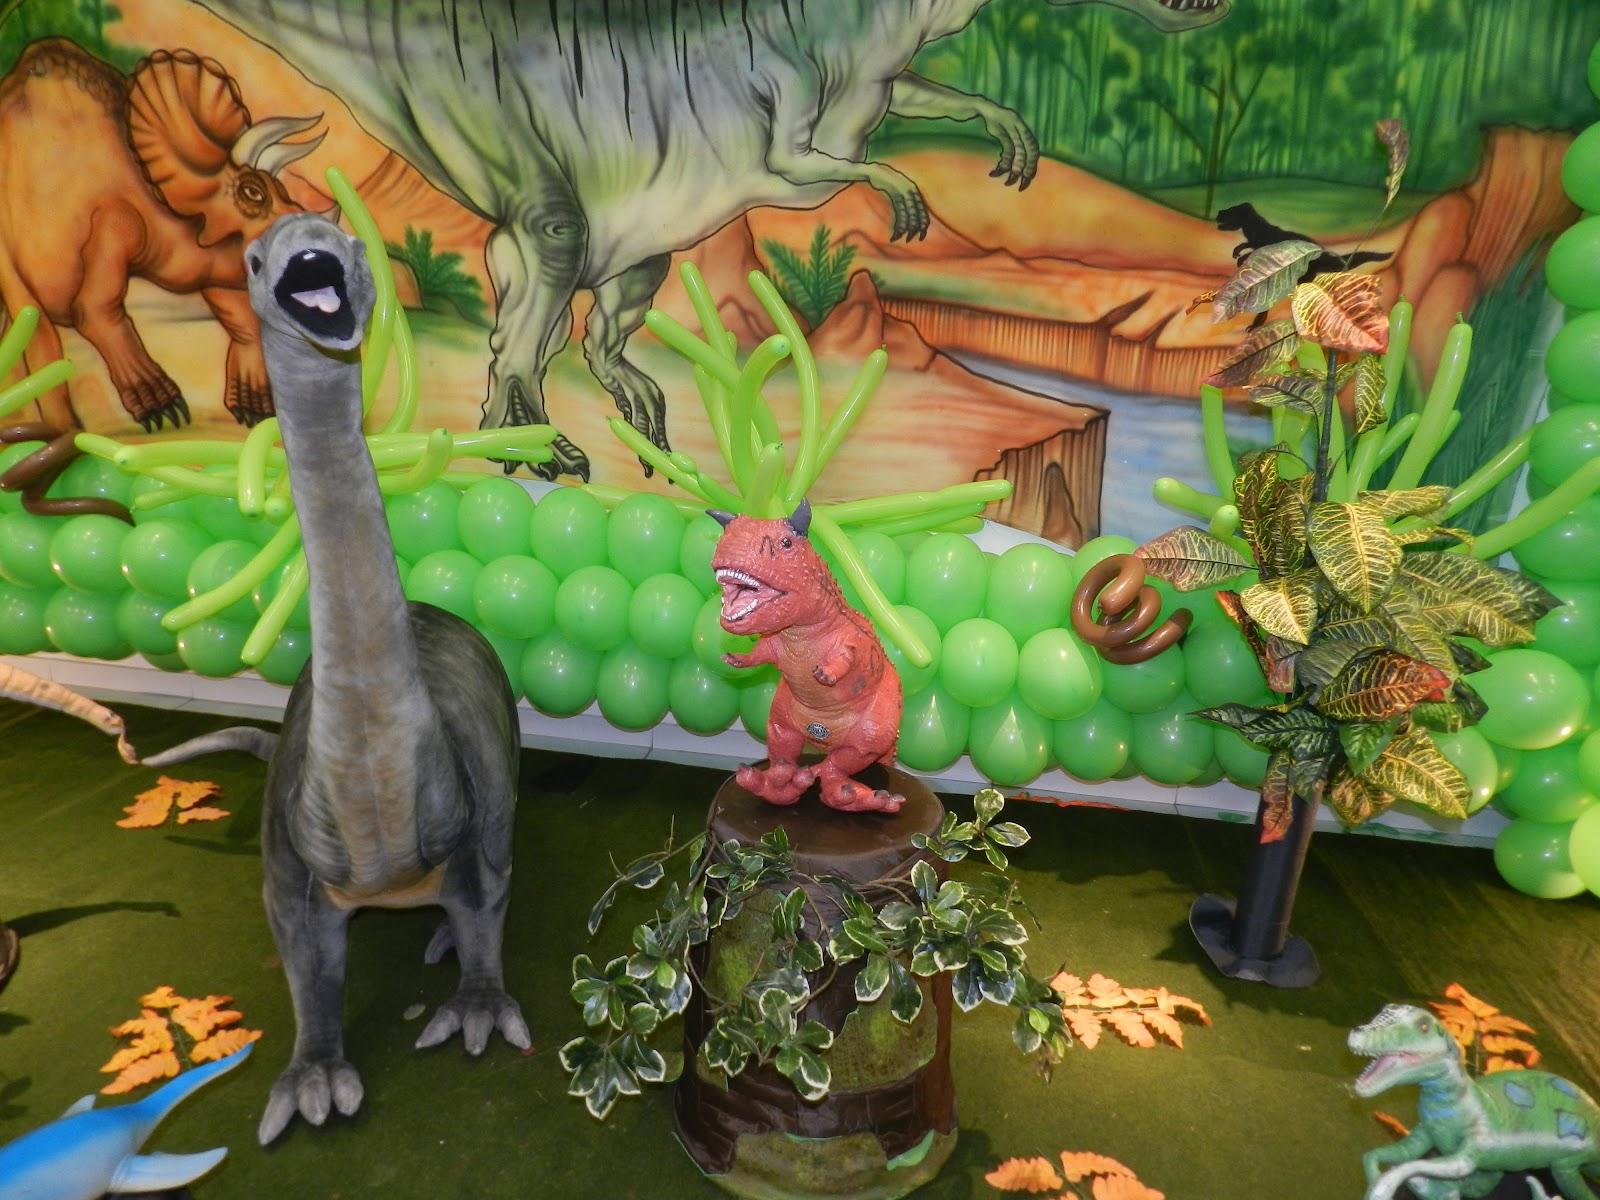 decoracao-para-aniversario-infantil-tema-dinossauro